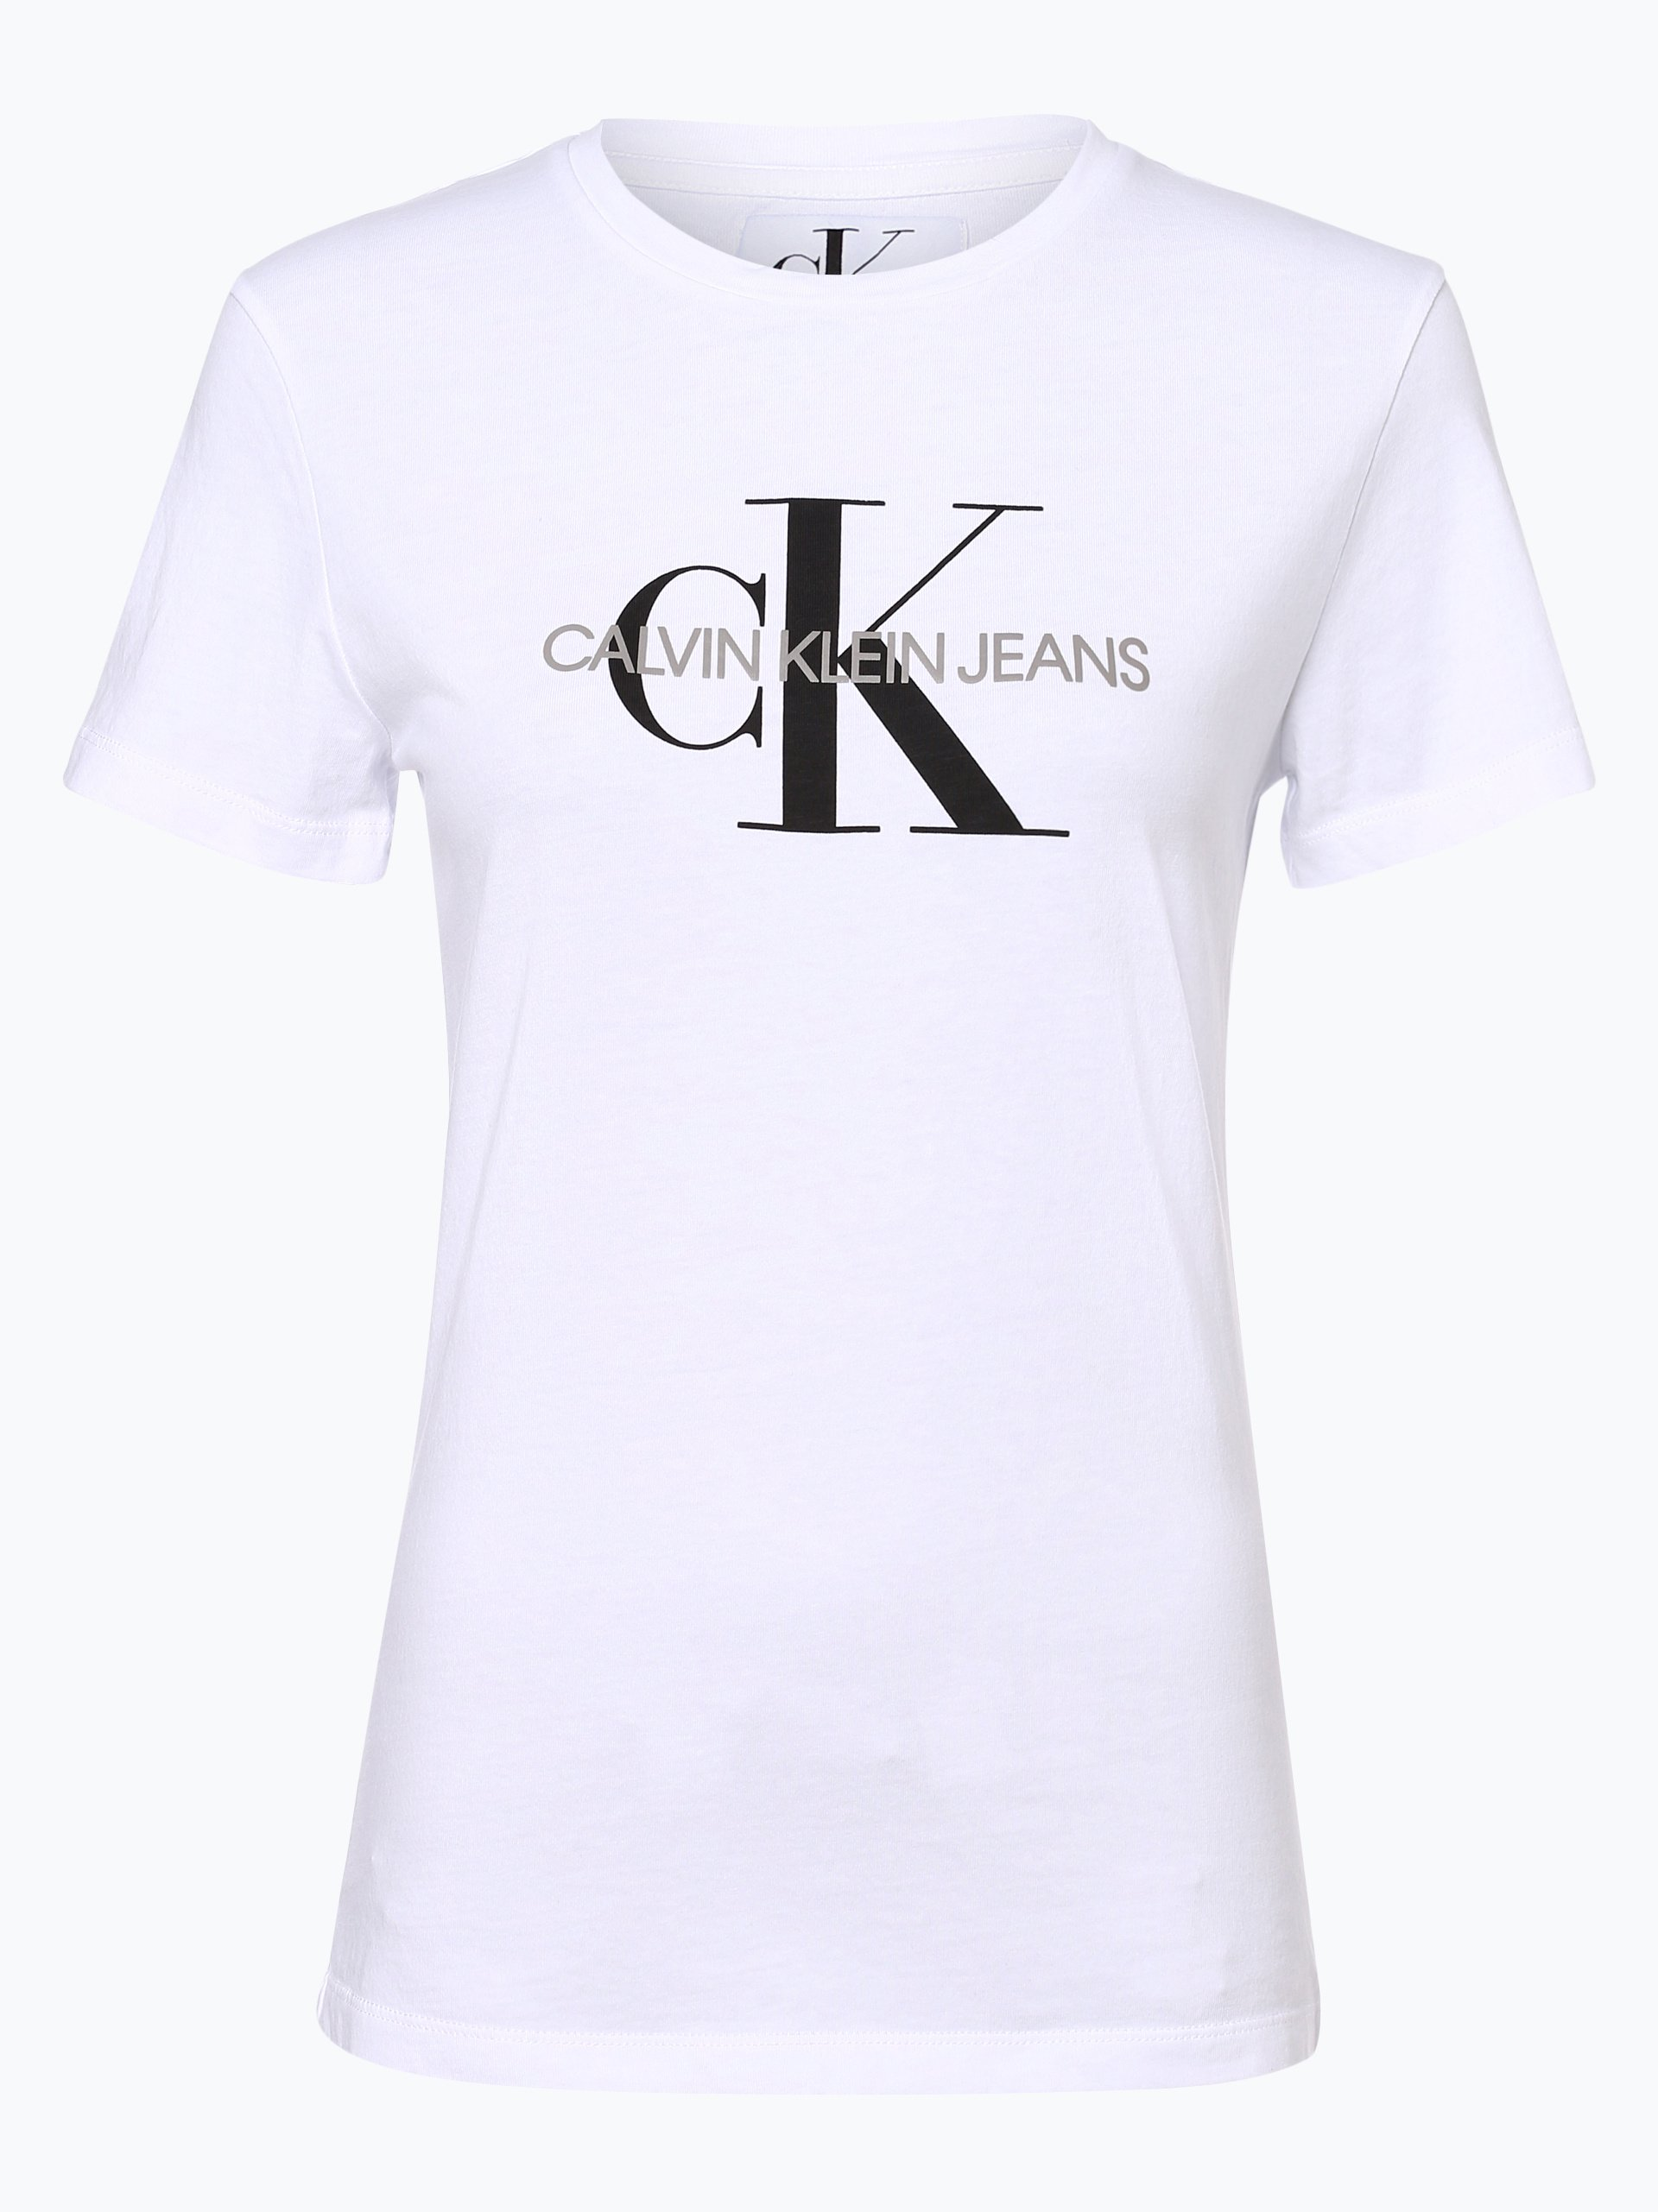 Calvin Klein Jeans T-shirt damski – Heather